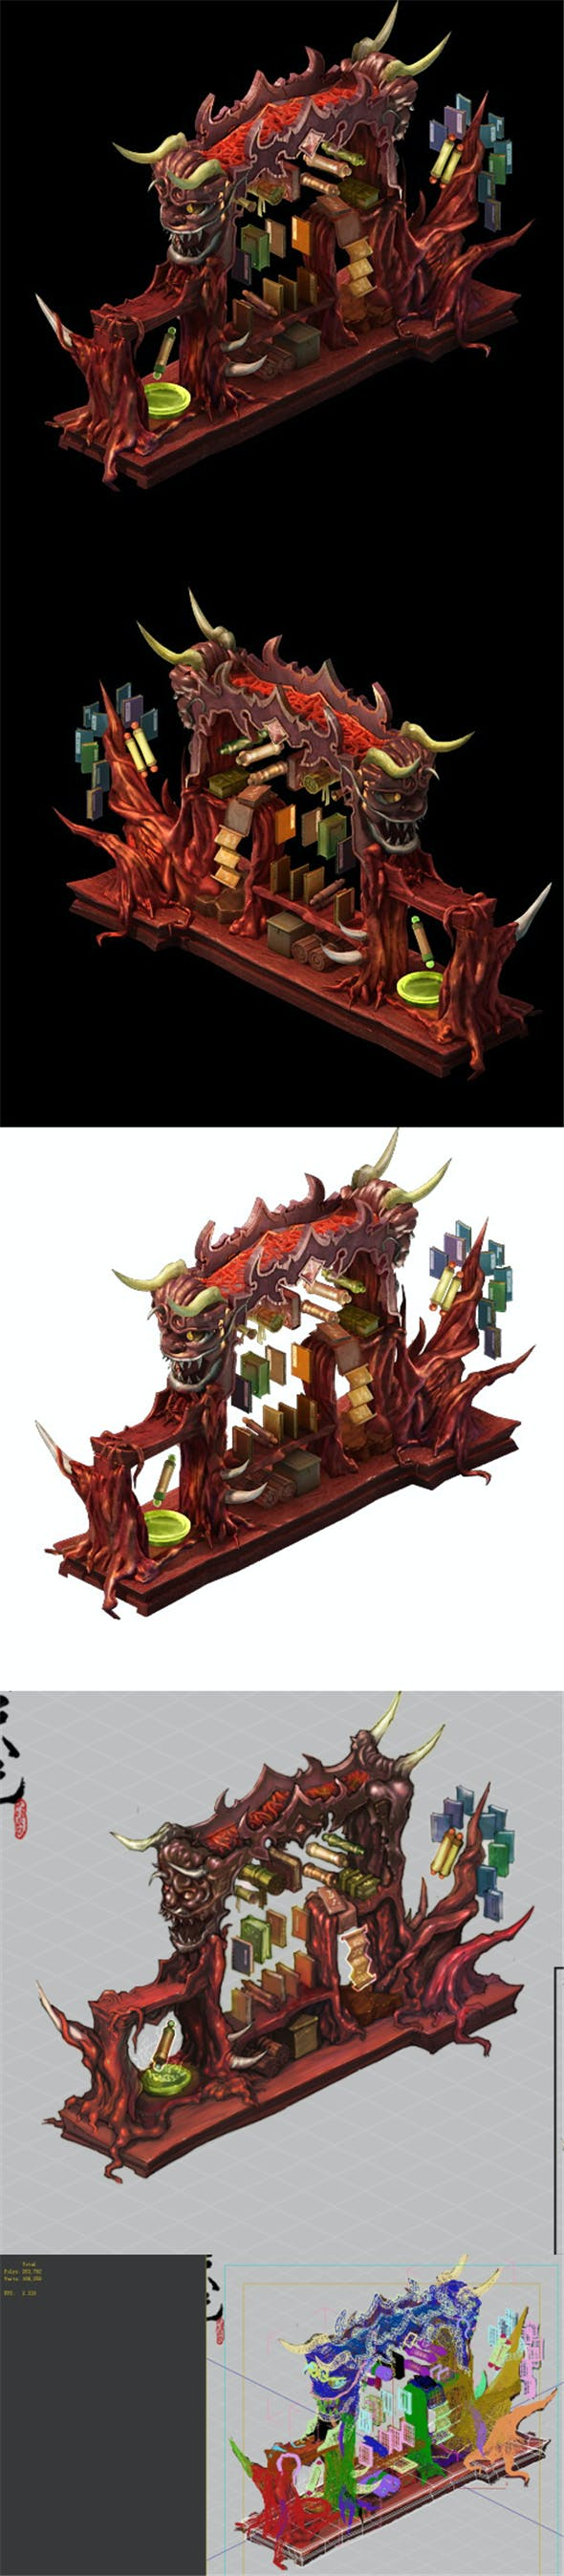 Game Model - Family Objects - Zijin Lighthouse Bookshelf - 3DOcean Item for Sale